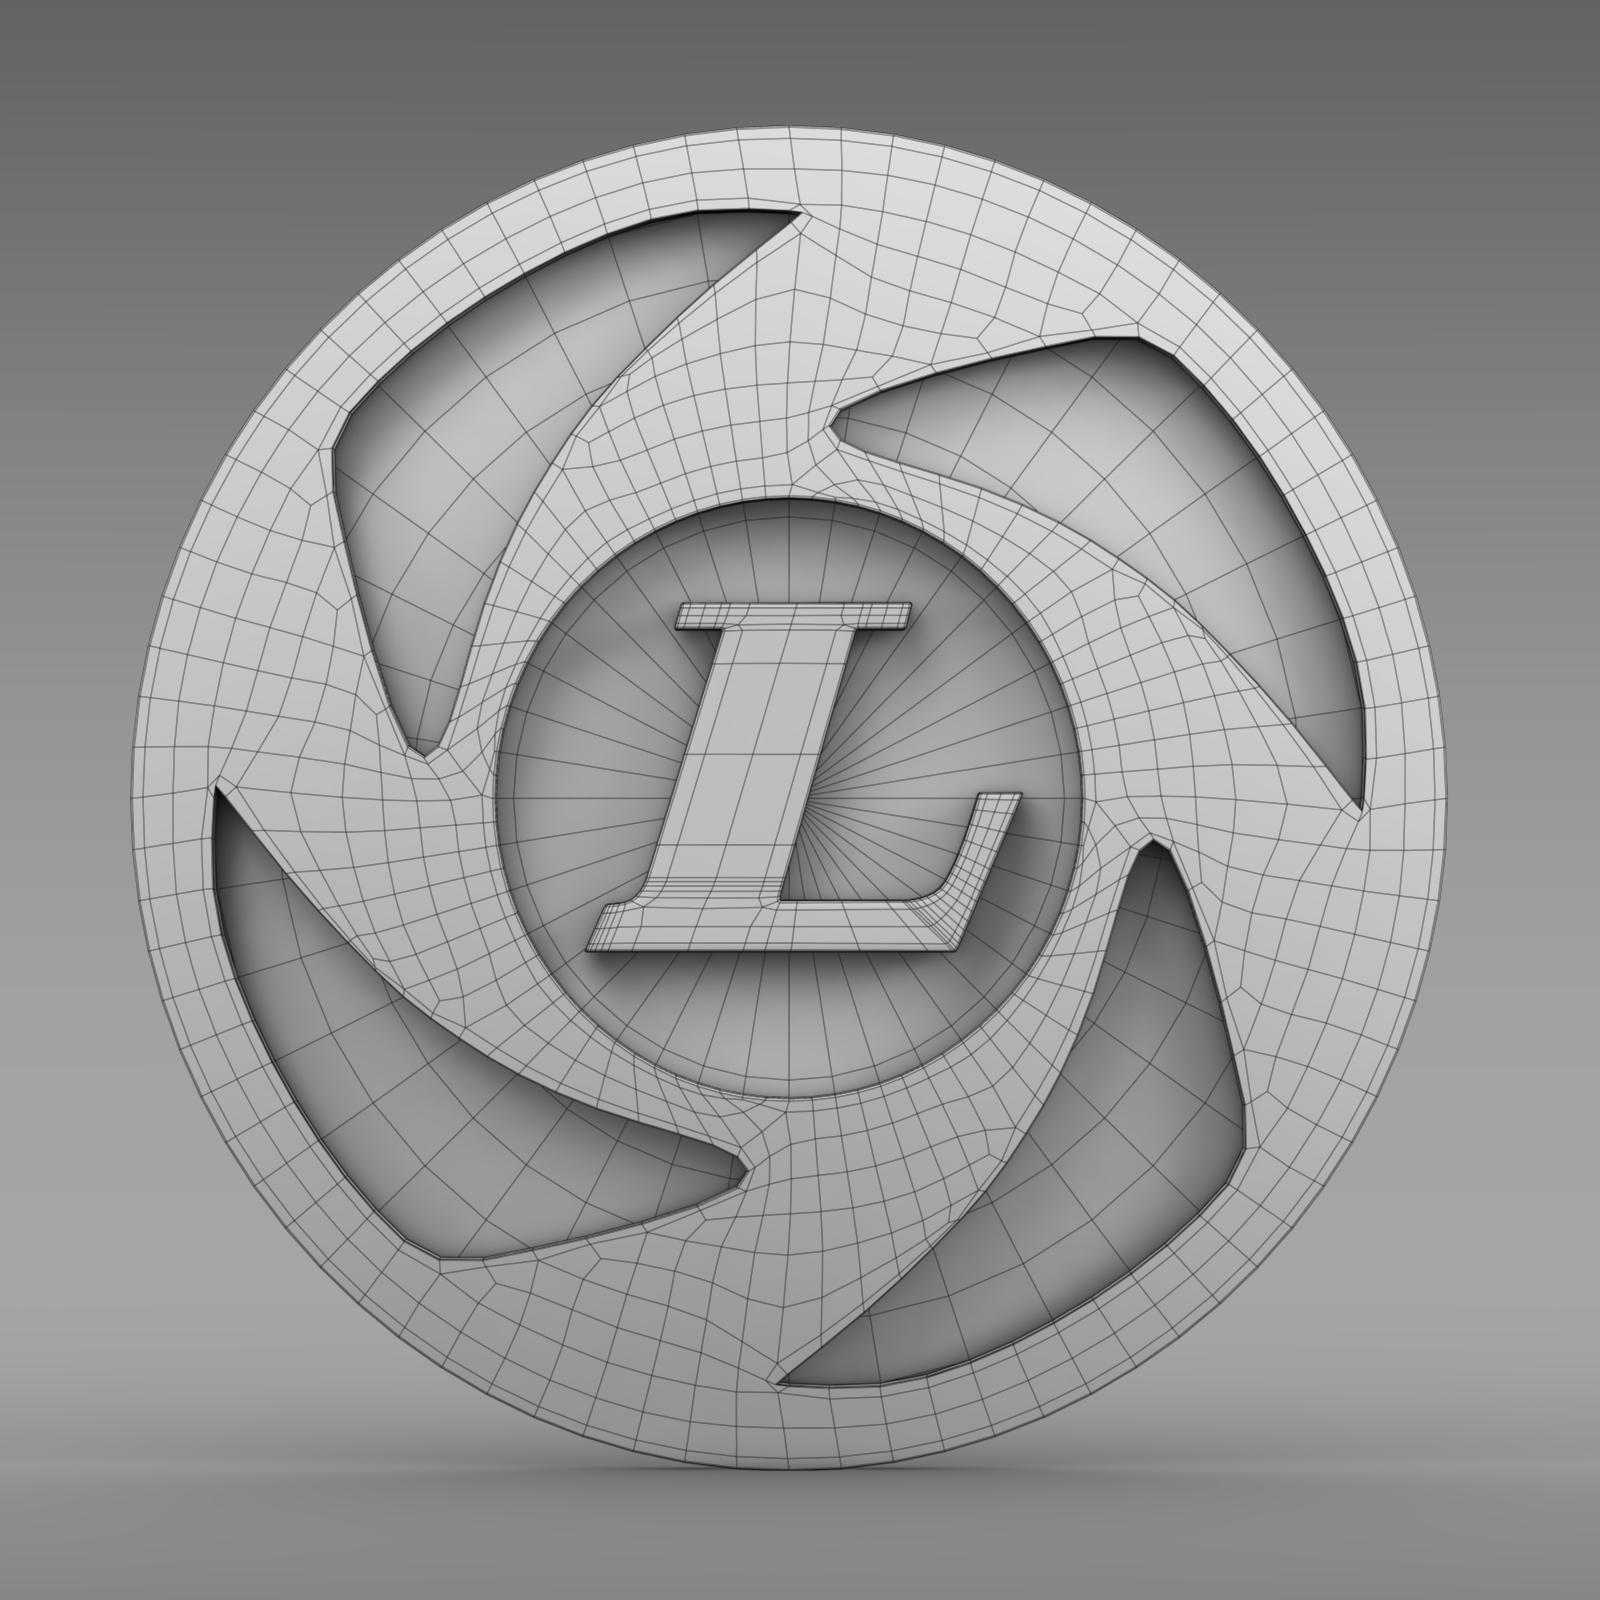 ashok leyland logo 3d model � buy ashok leyland logo 3d